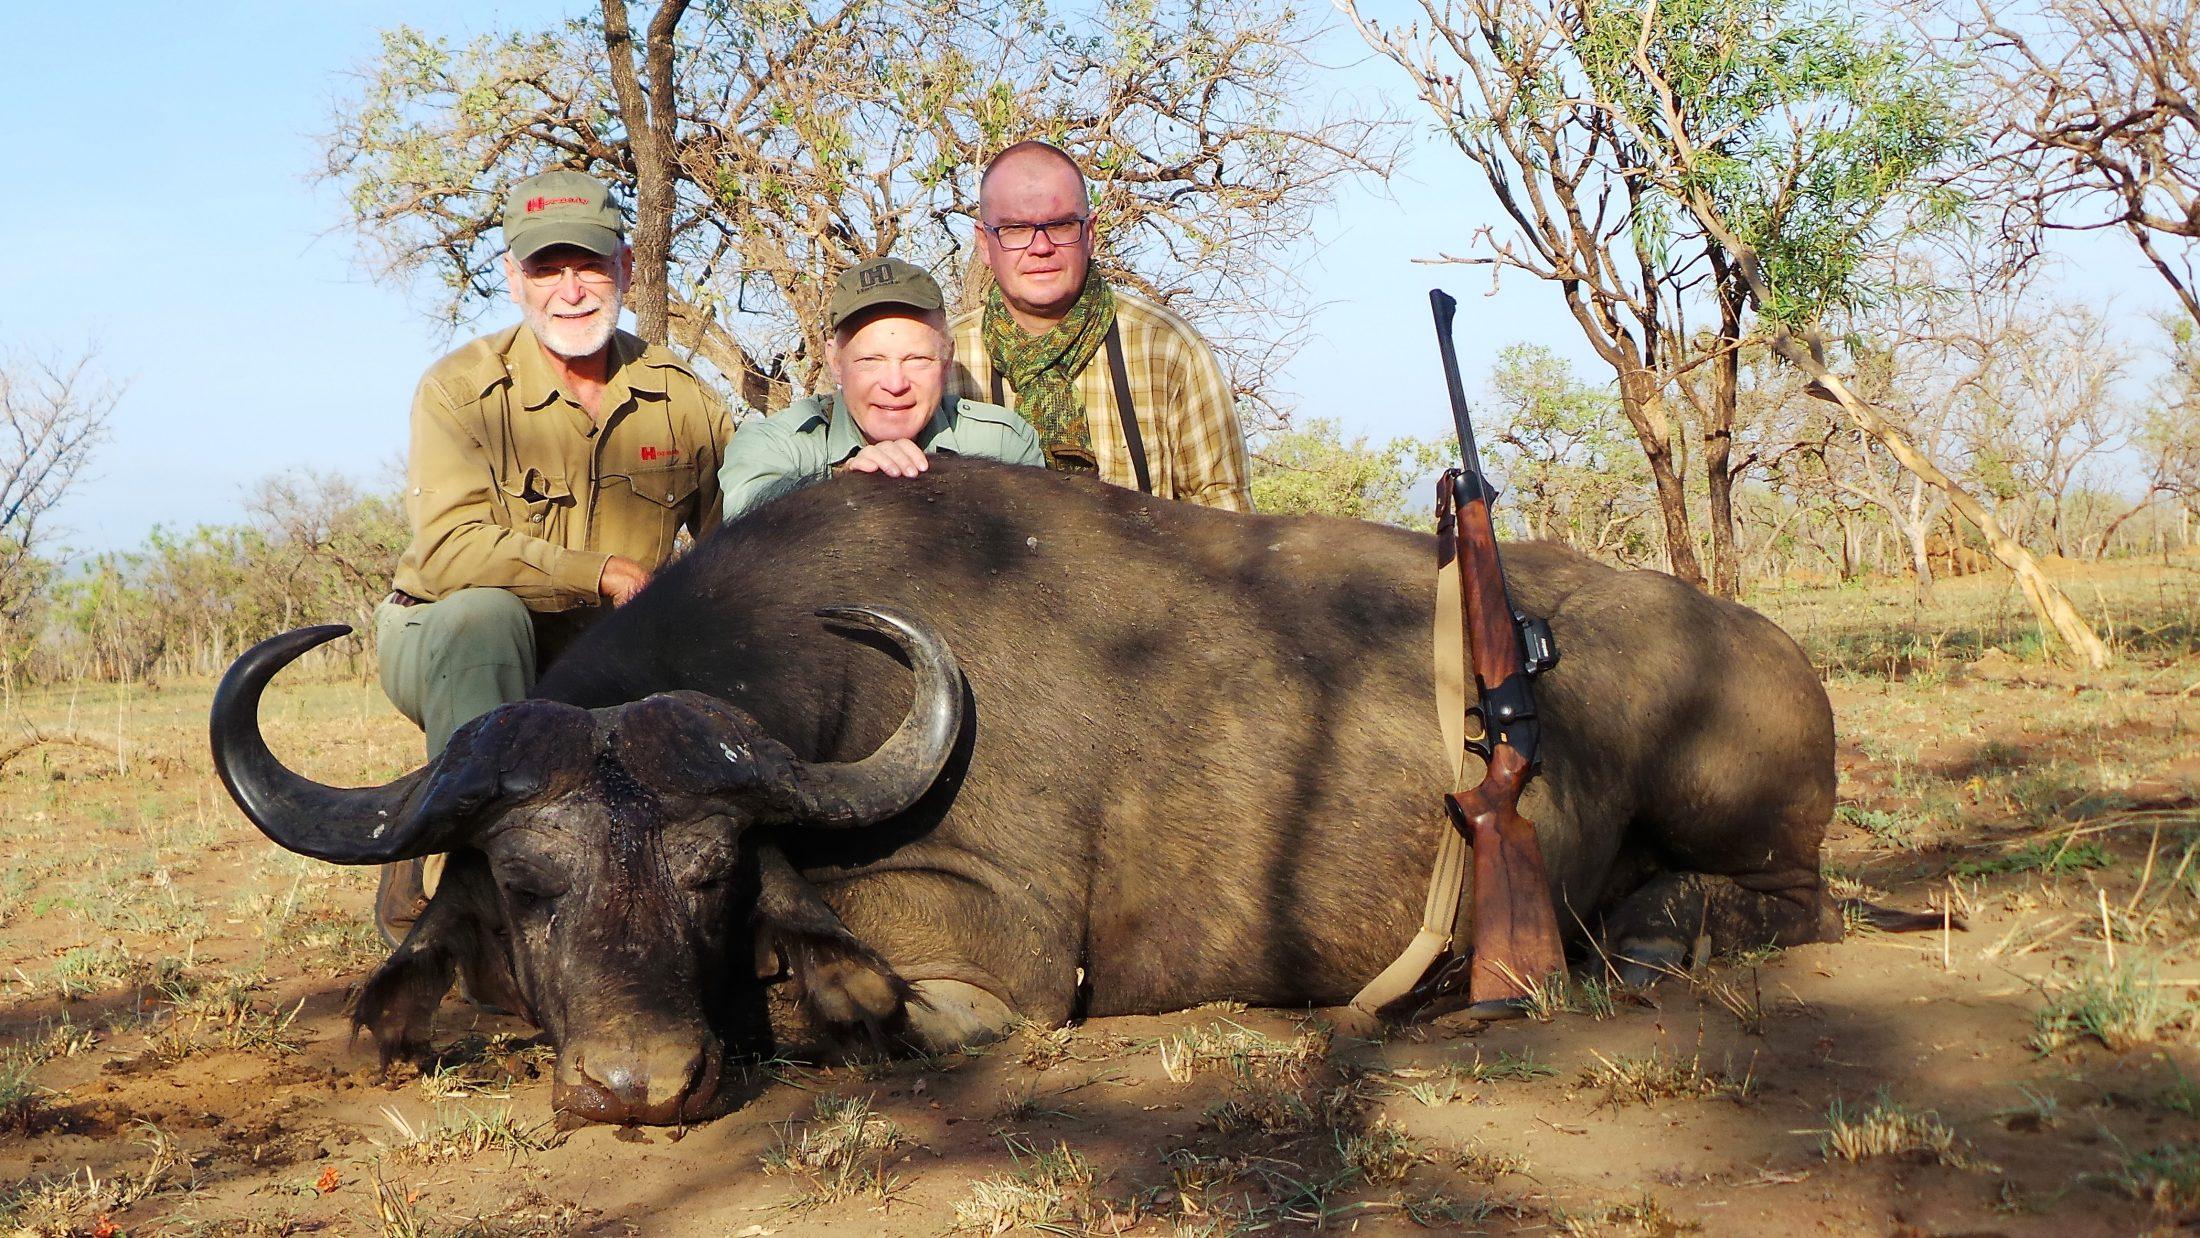 uganda wildlife safaris trophy photos 2017 (2) buffalo